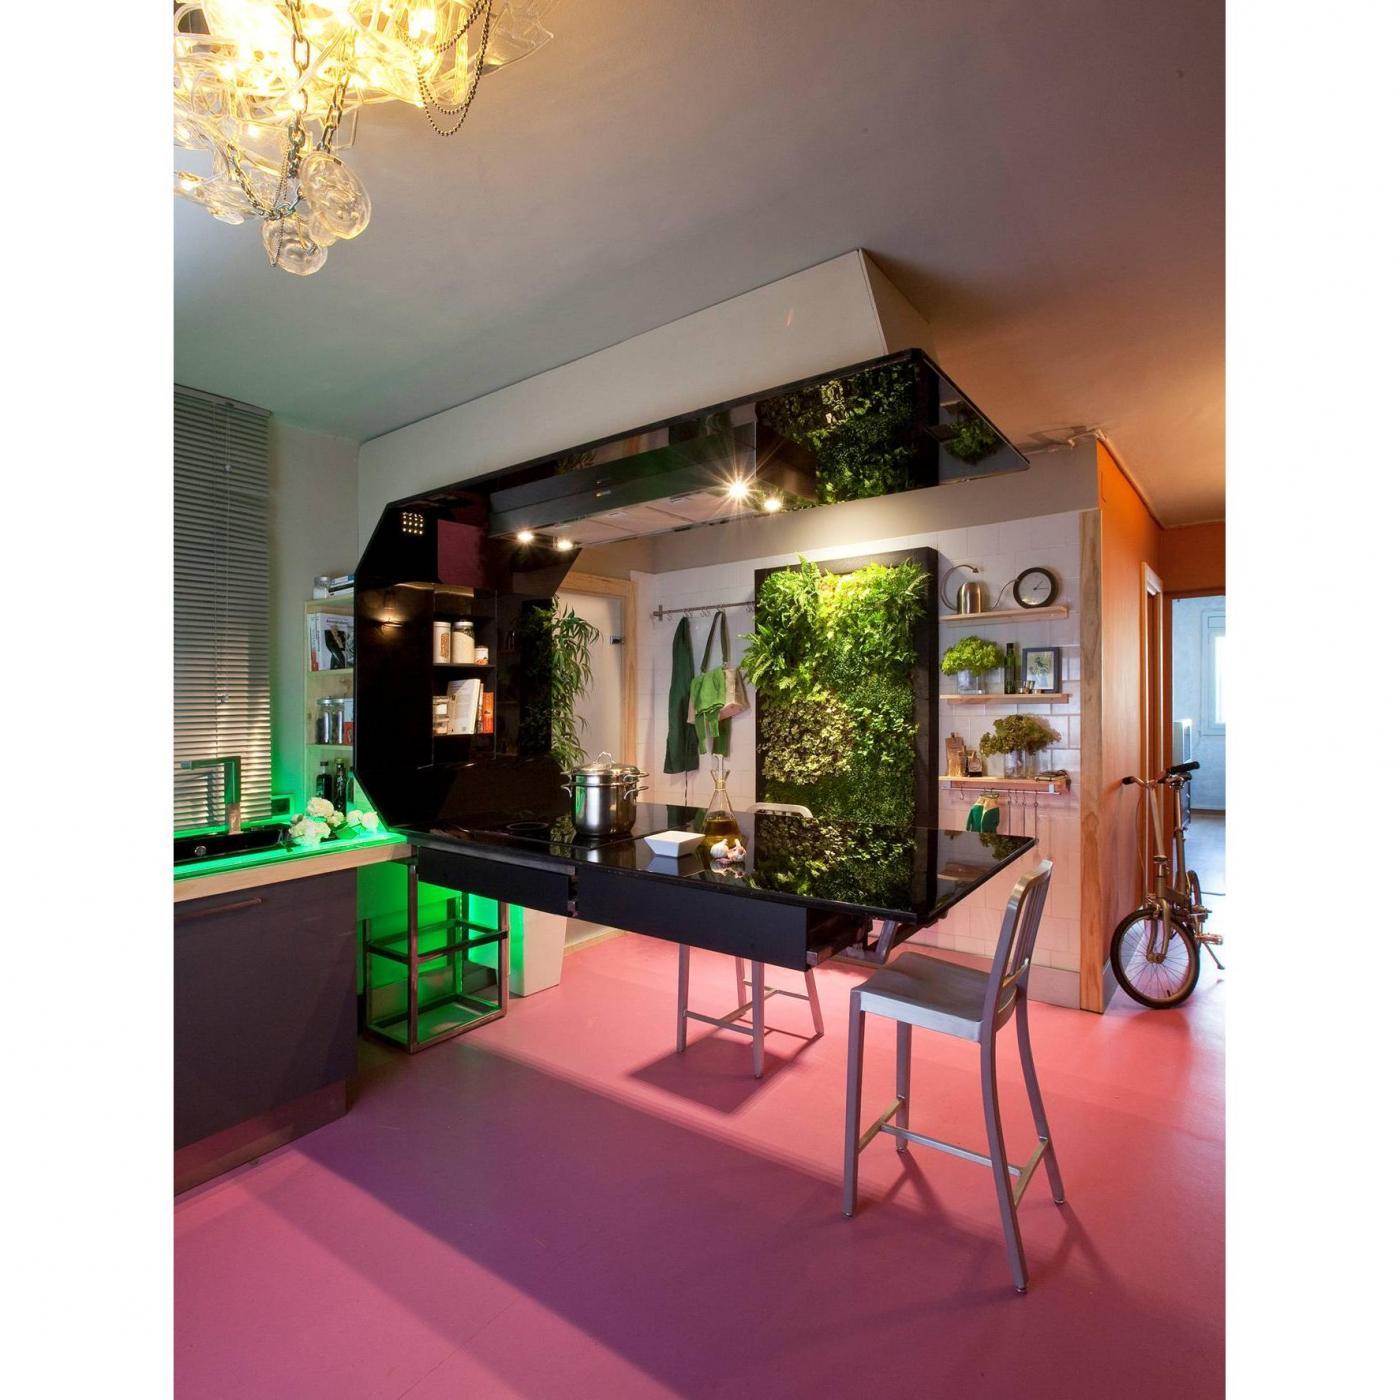 jardim vertical venda:Jardim vertical por €842,95 em Planeta Huerto